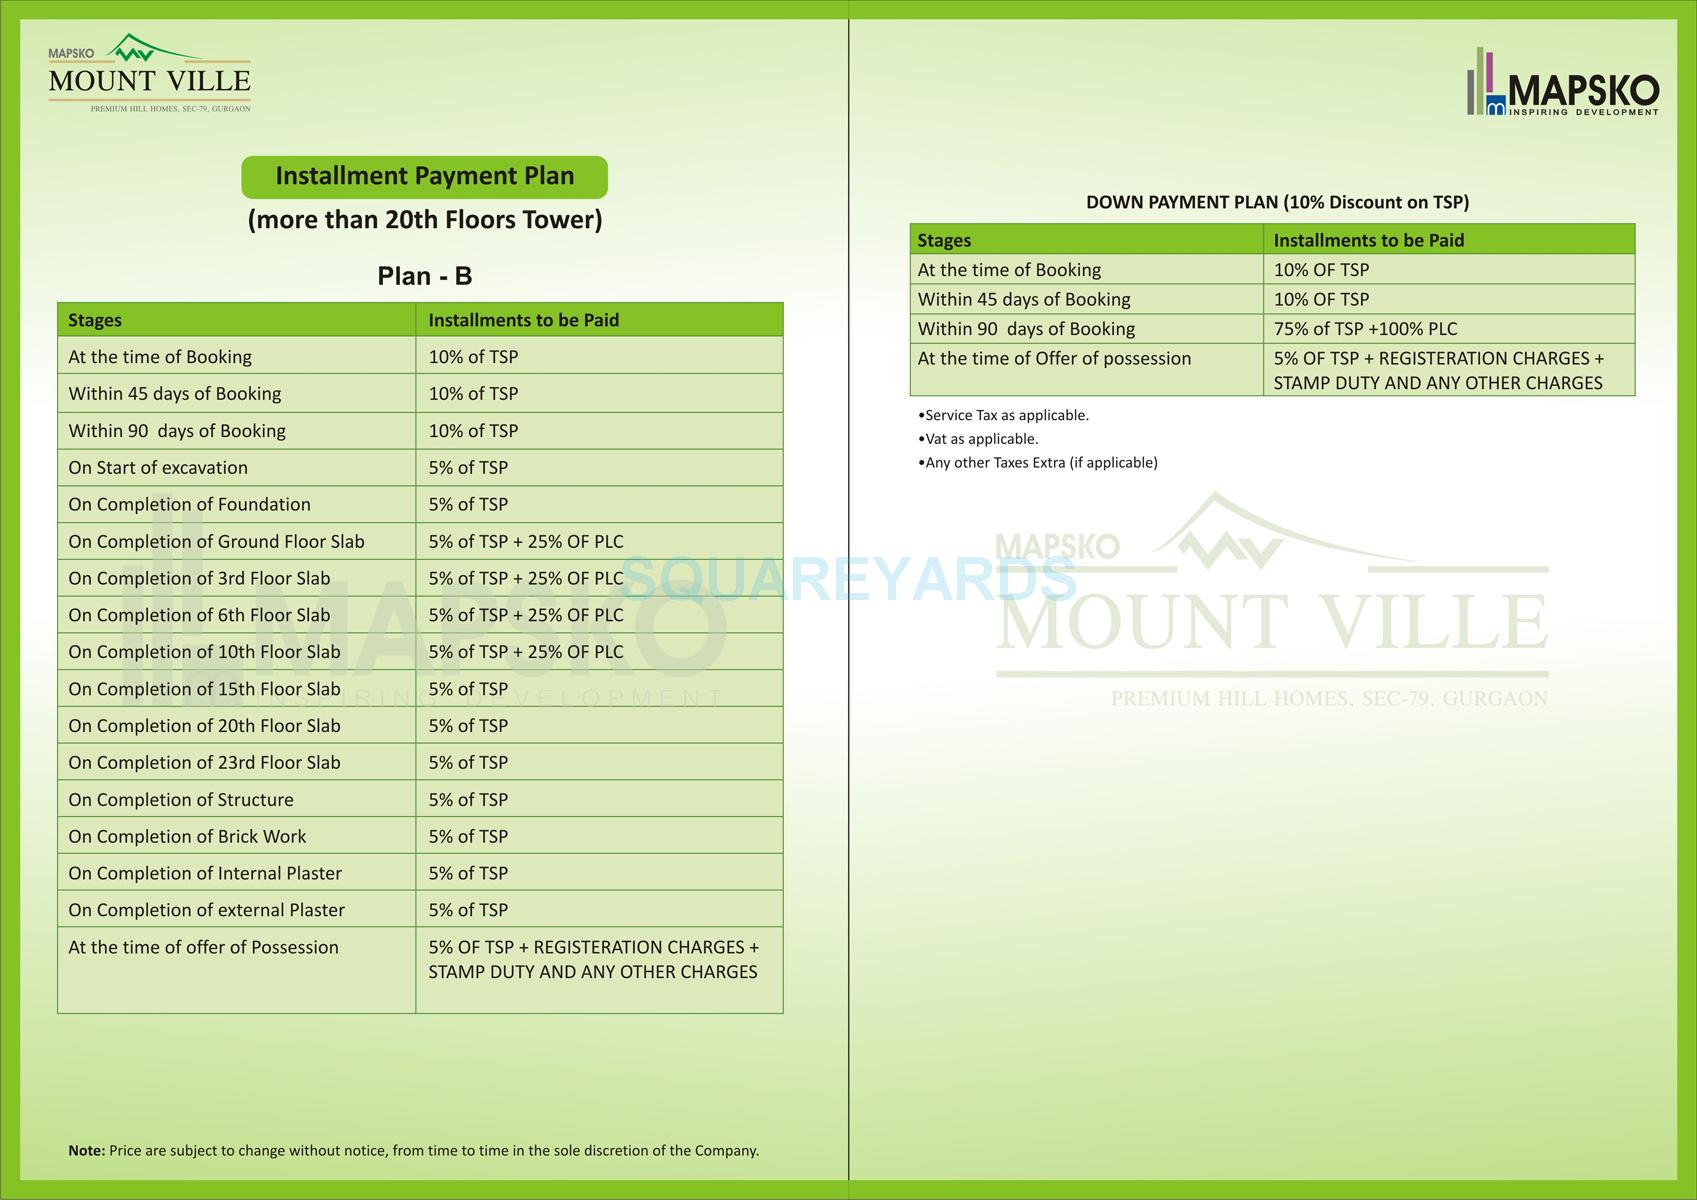 mapsko mount ville payment plan image2